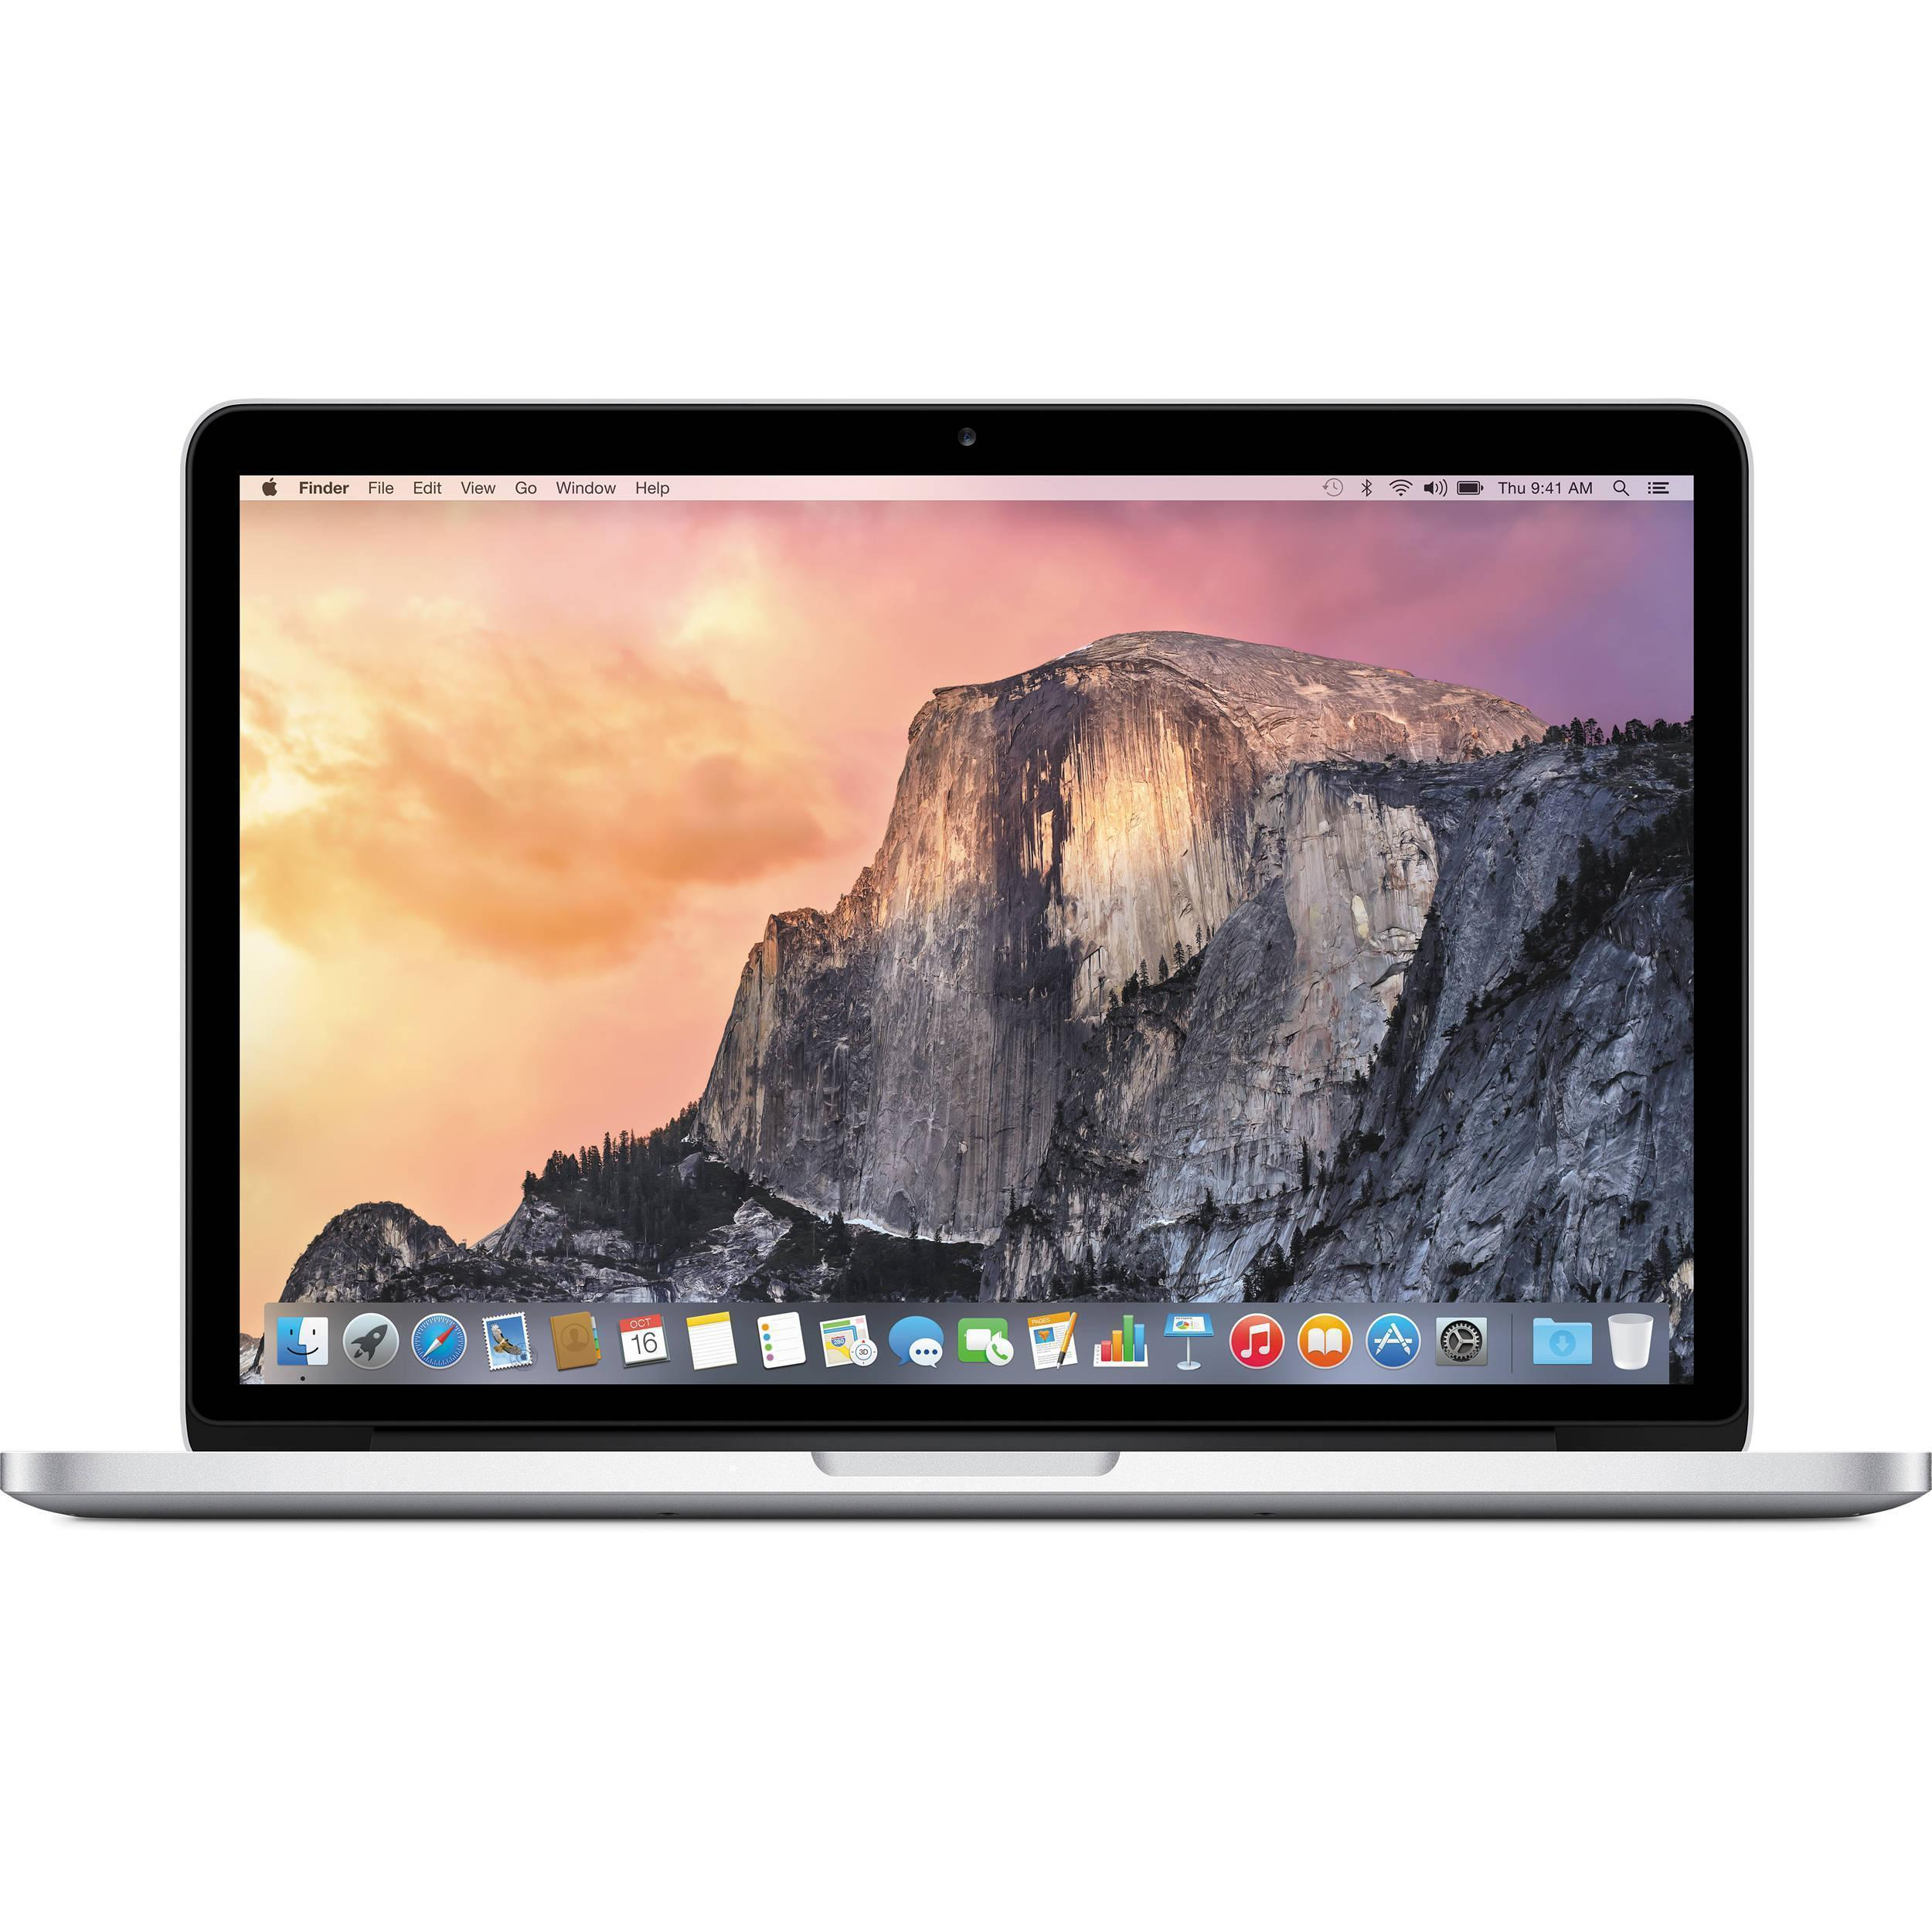 MacBook Pro Retina 13.3-inch (2013) - Core i5 - 8GB - SSD 256 GB QWERTY - Spanish